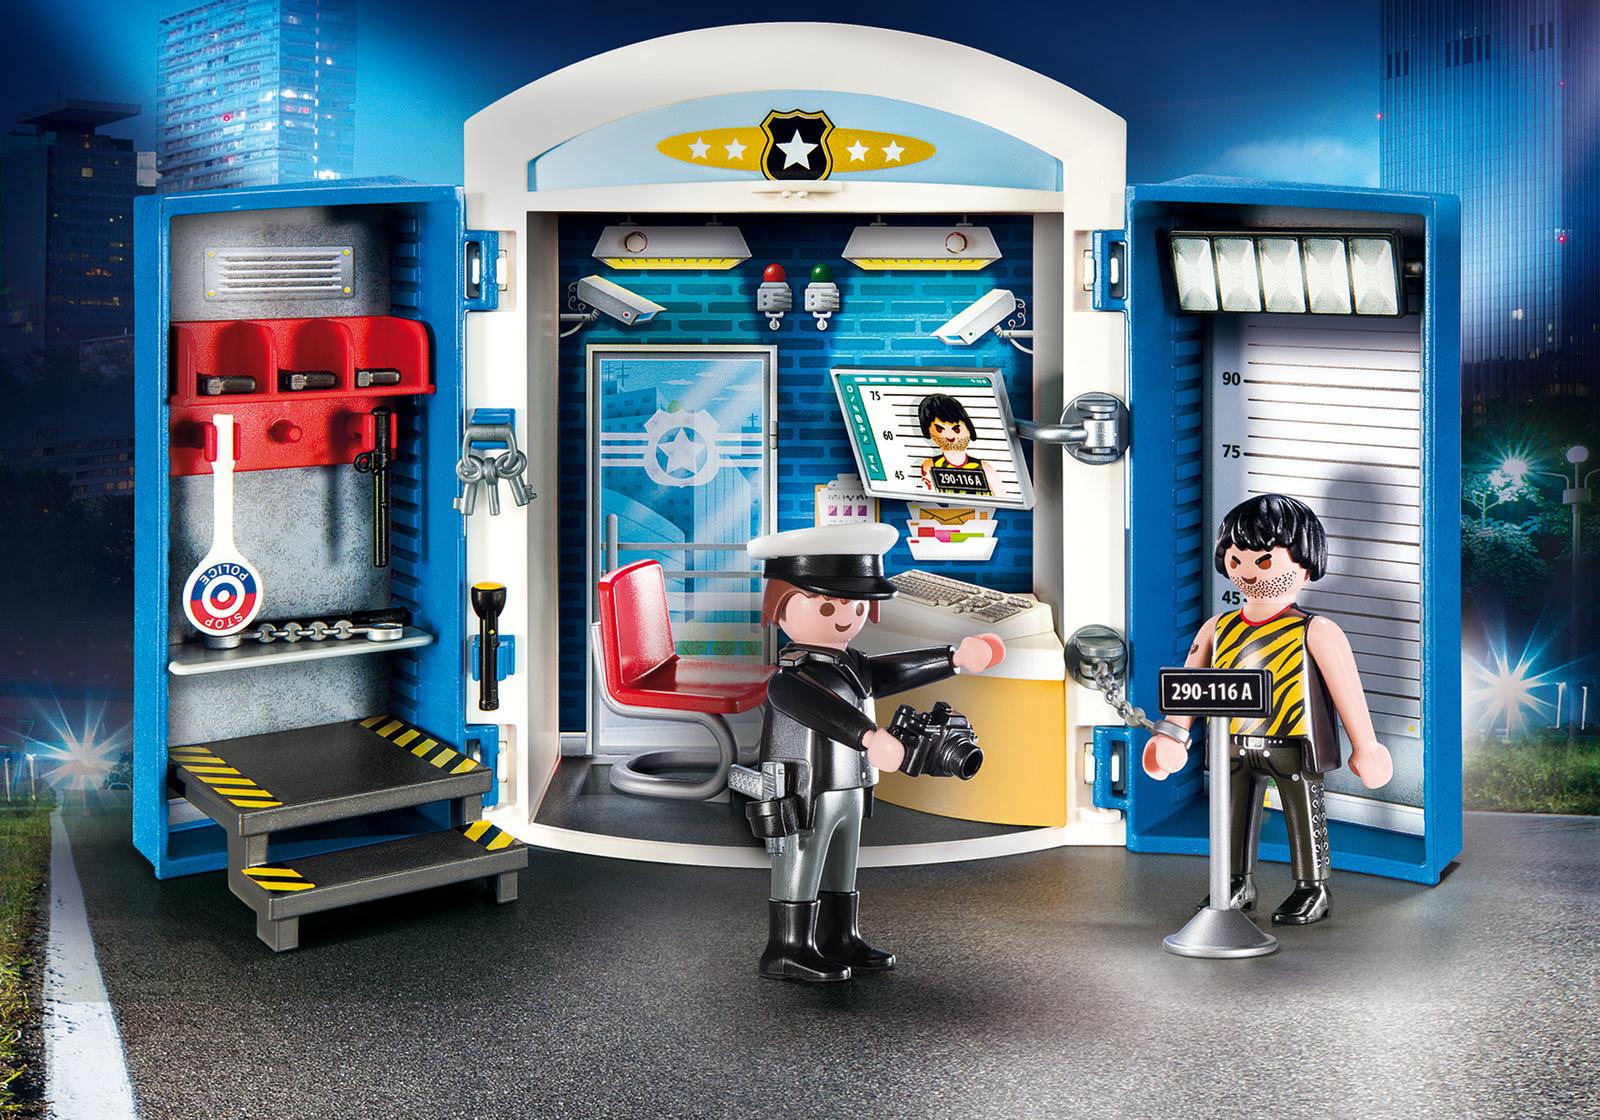 Playmobil 9111 Police Station Play Box (Playsets) £15.99 ebay / playmobiluk